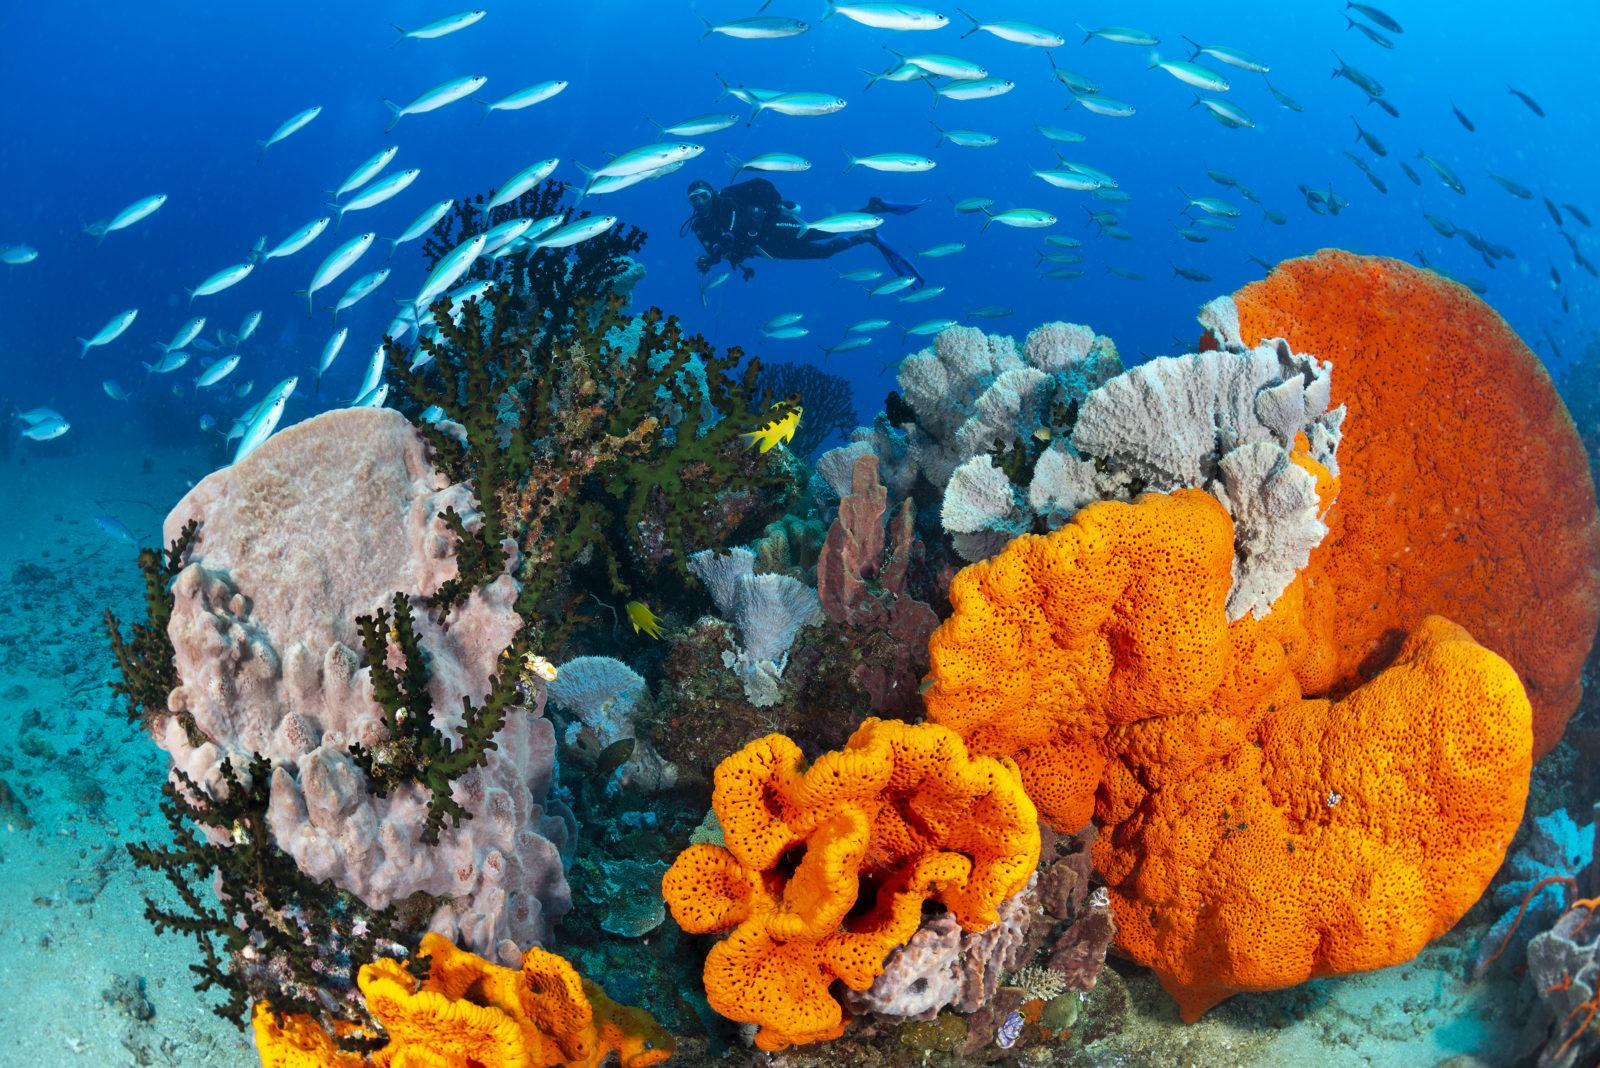 Ann Sophies Reef by Gary Bell at Walindi Resort